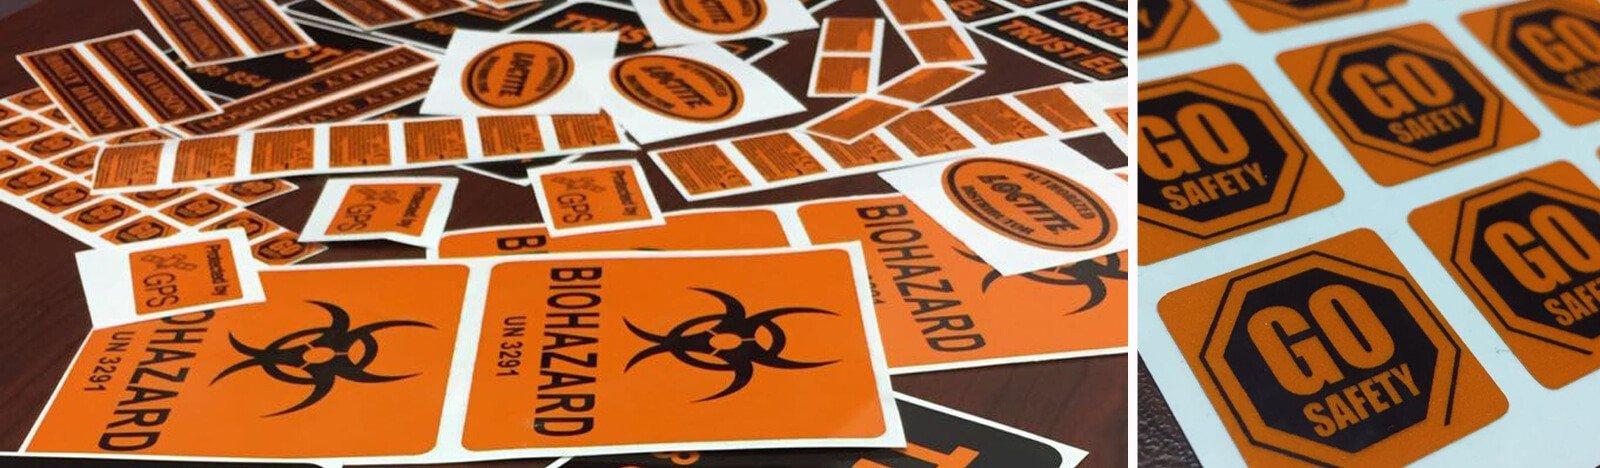 Construction Stickers Orange Reflective Stickers